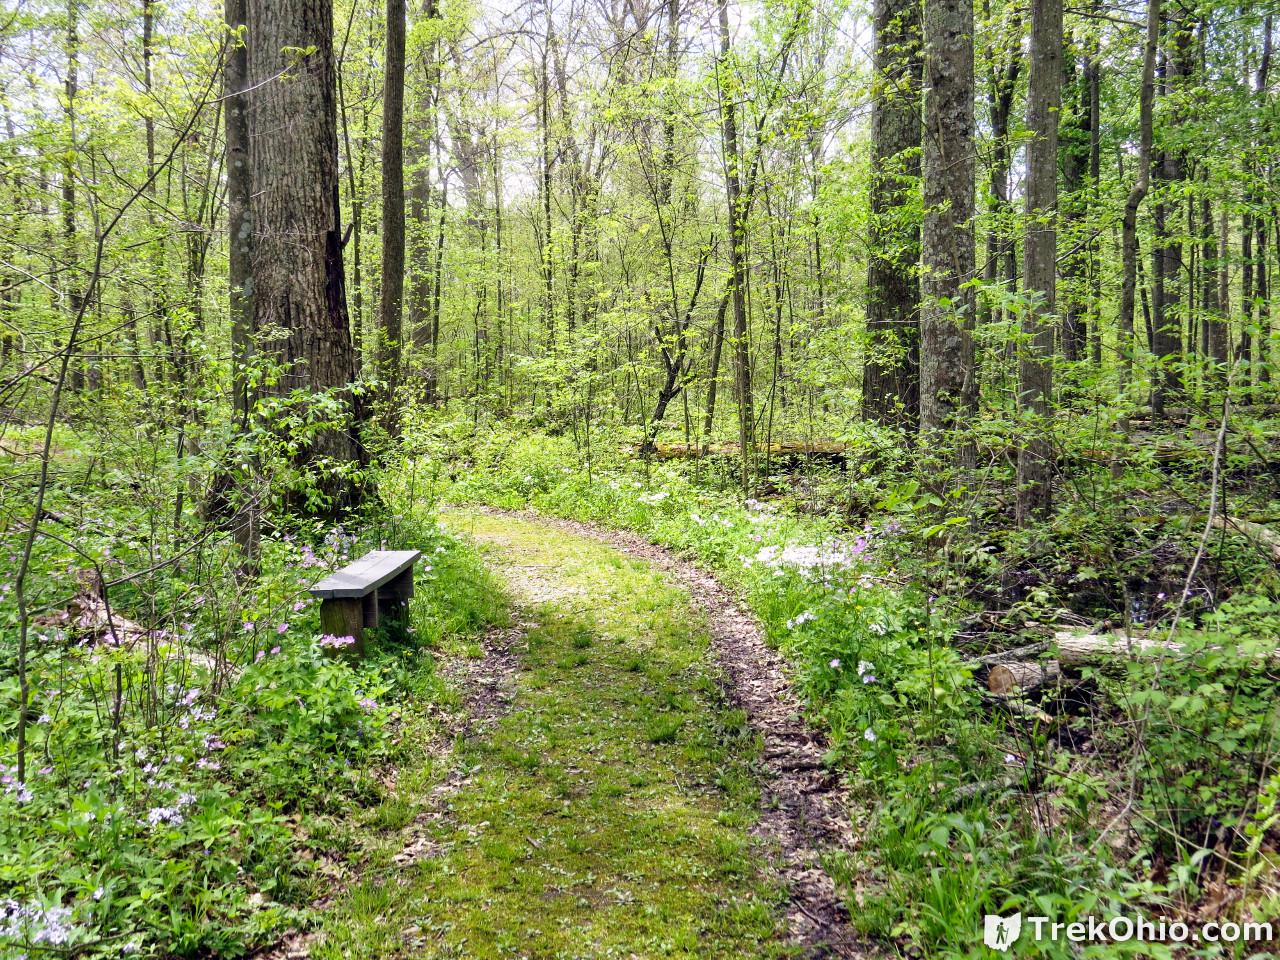 Goll Woods State Nature Preserve | TrekOhio